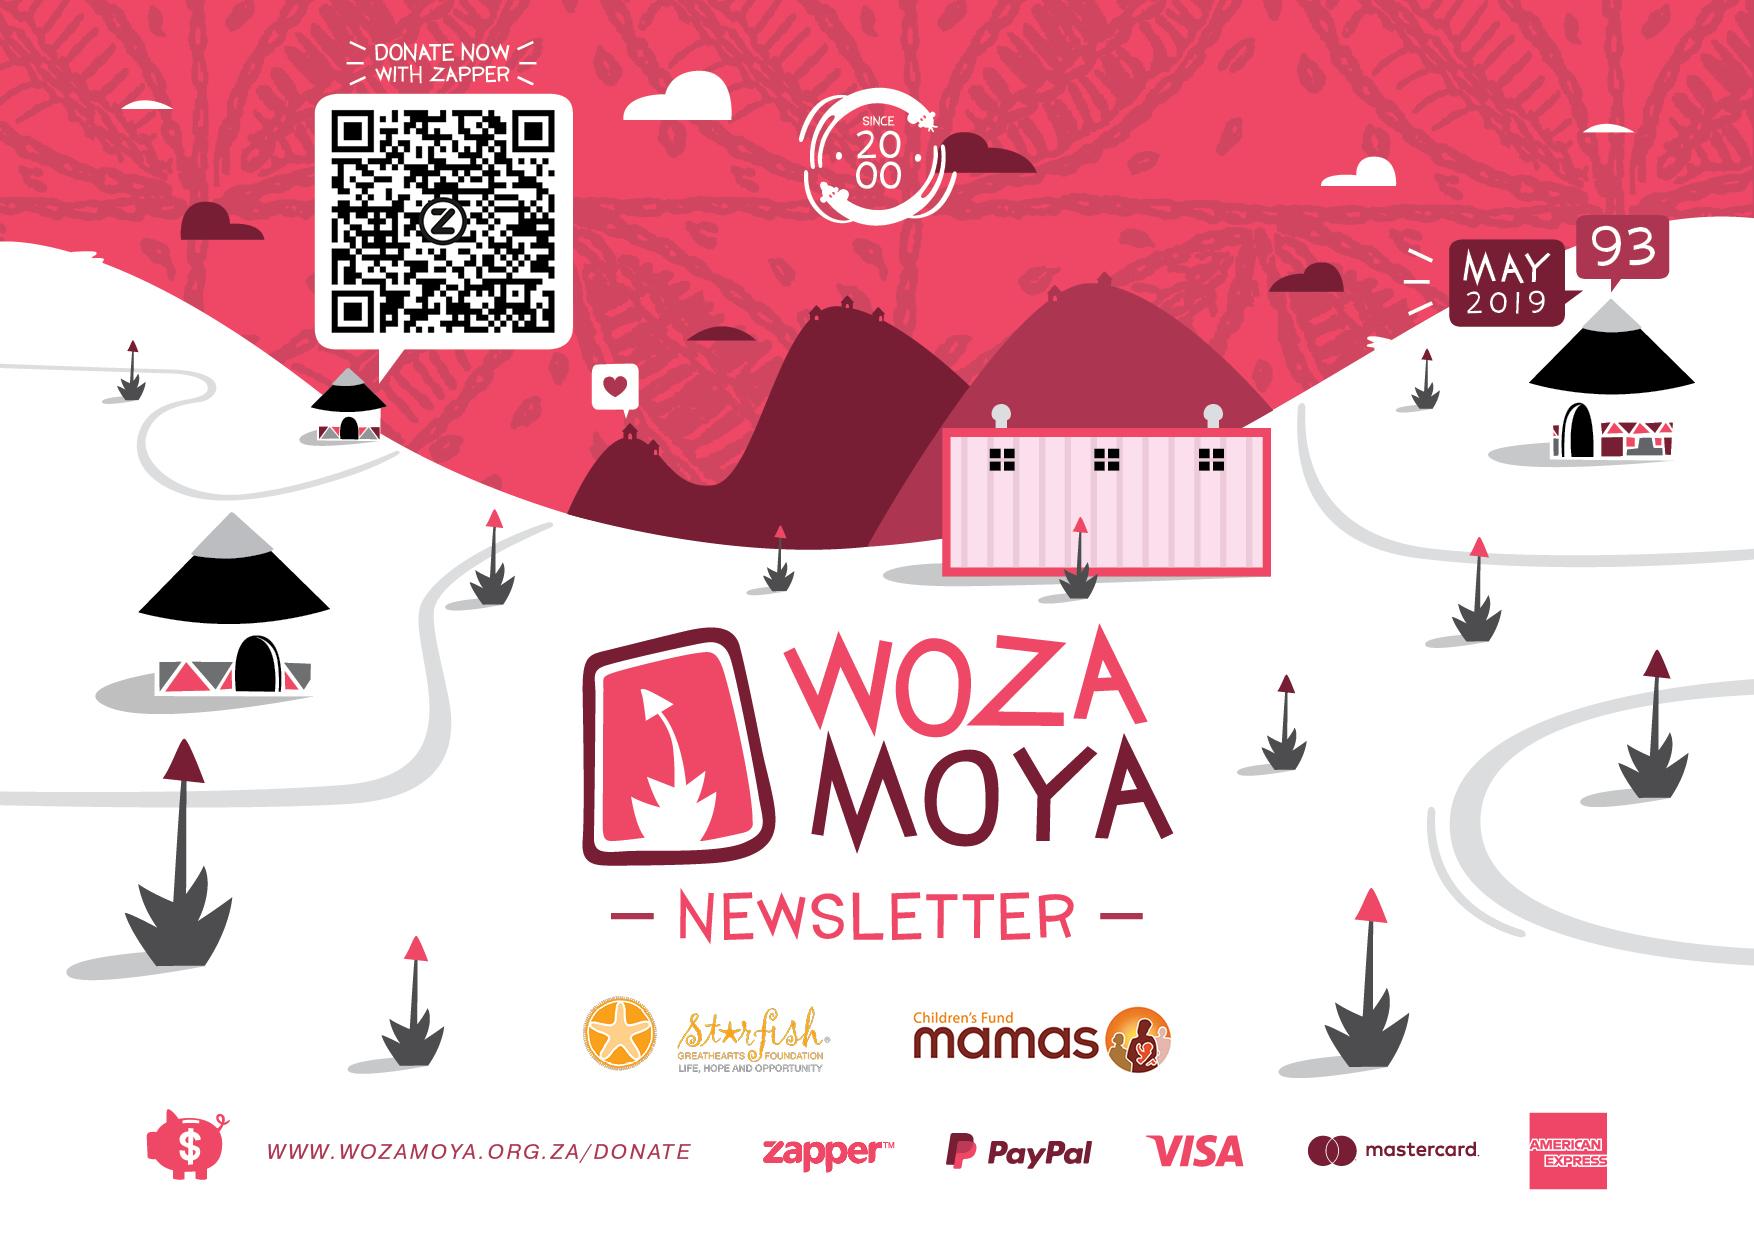 WozaMoya_Newsletter_93.jpg